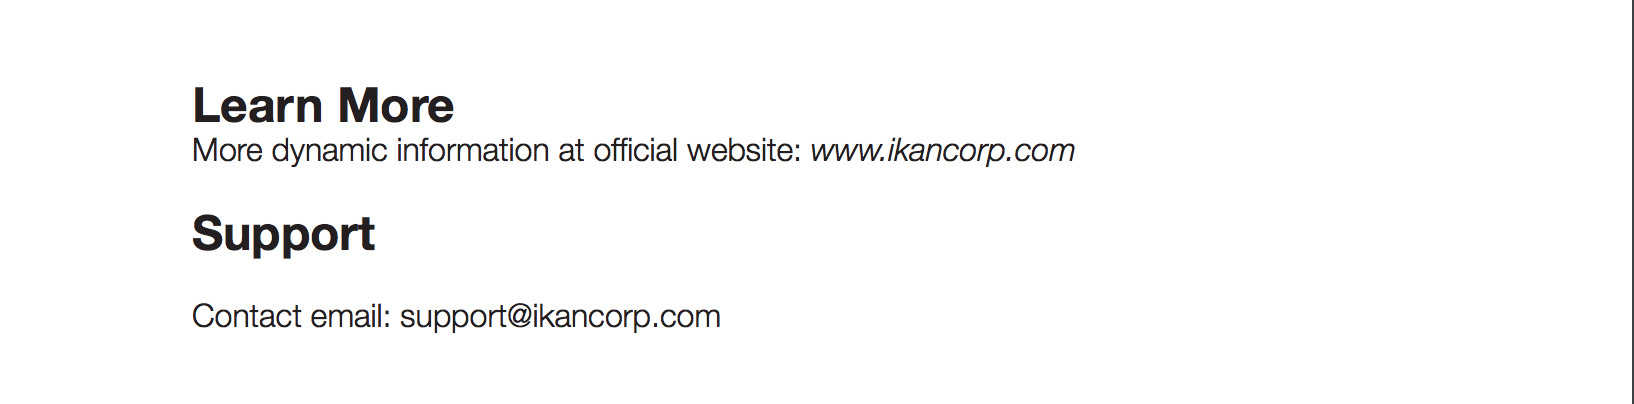 iKan Contact Details